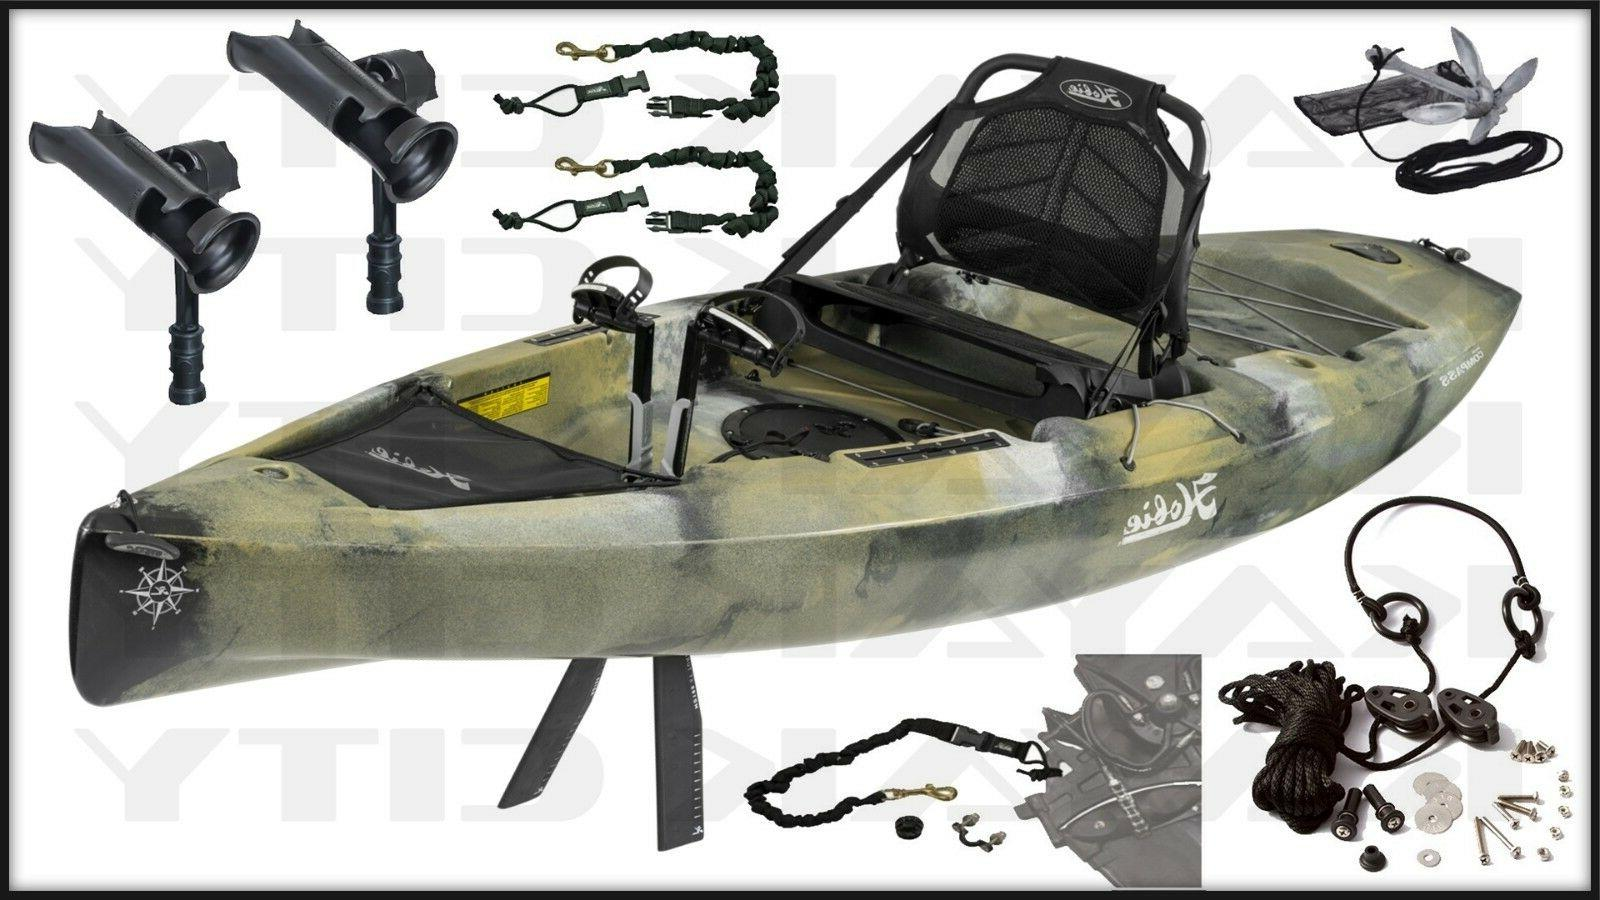 2019 mirage compass kayak fishing package multiple